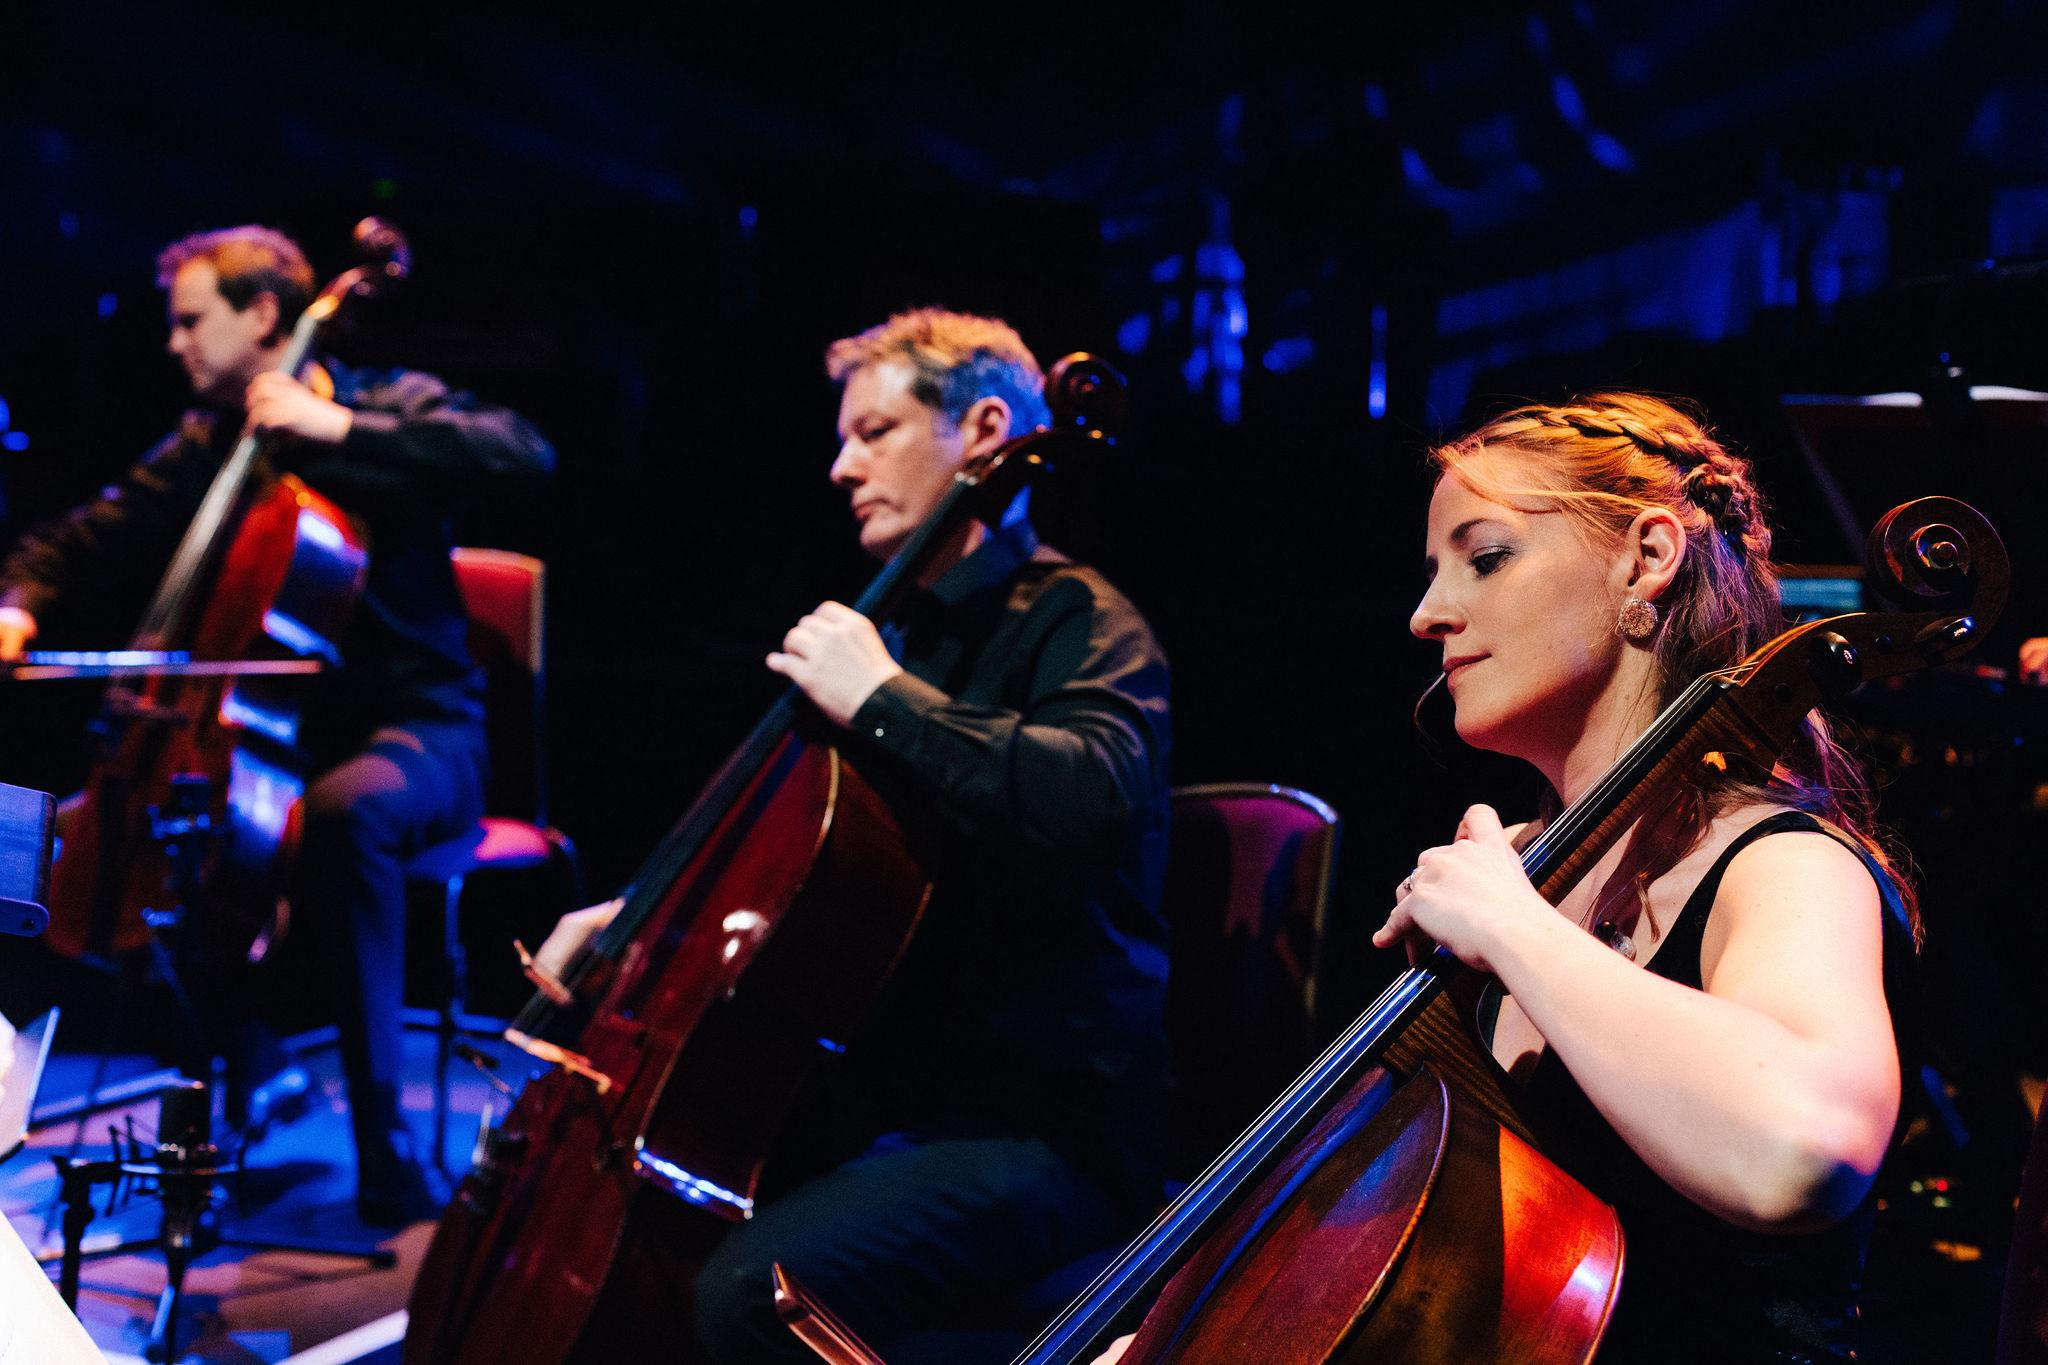 Portrait of cellist Katherine Jenkinson at the Royal Albert Hall